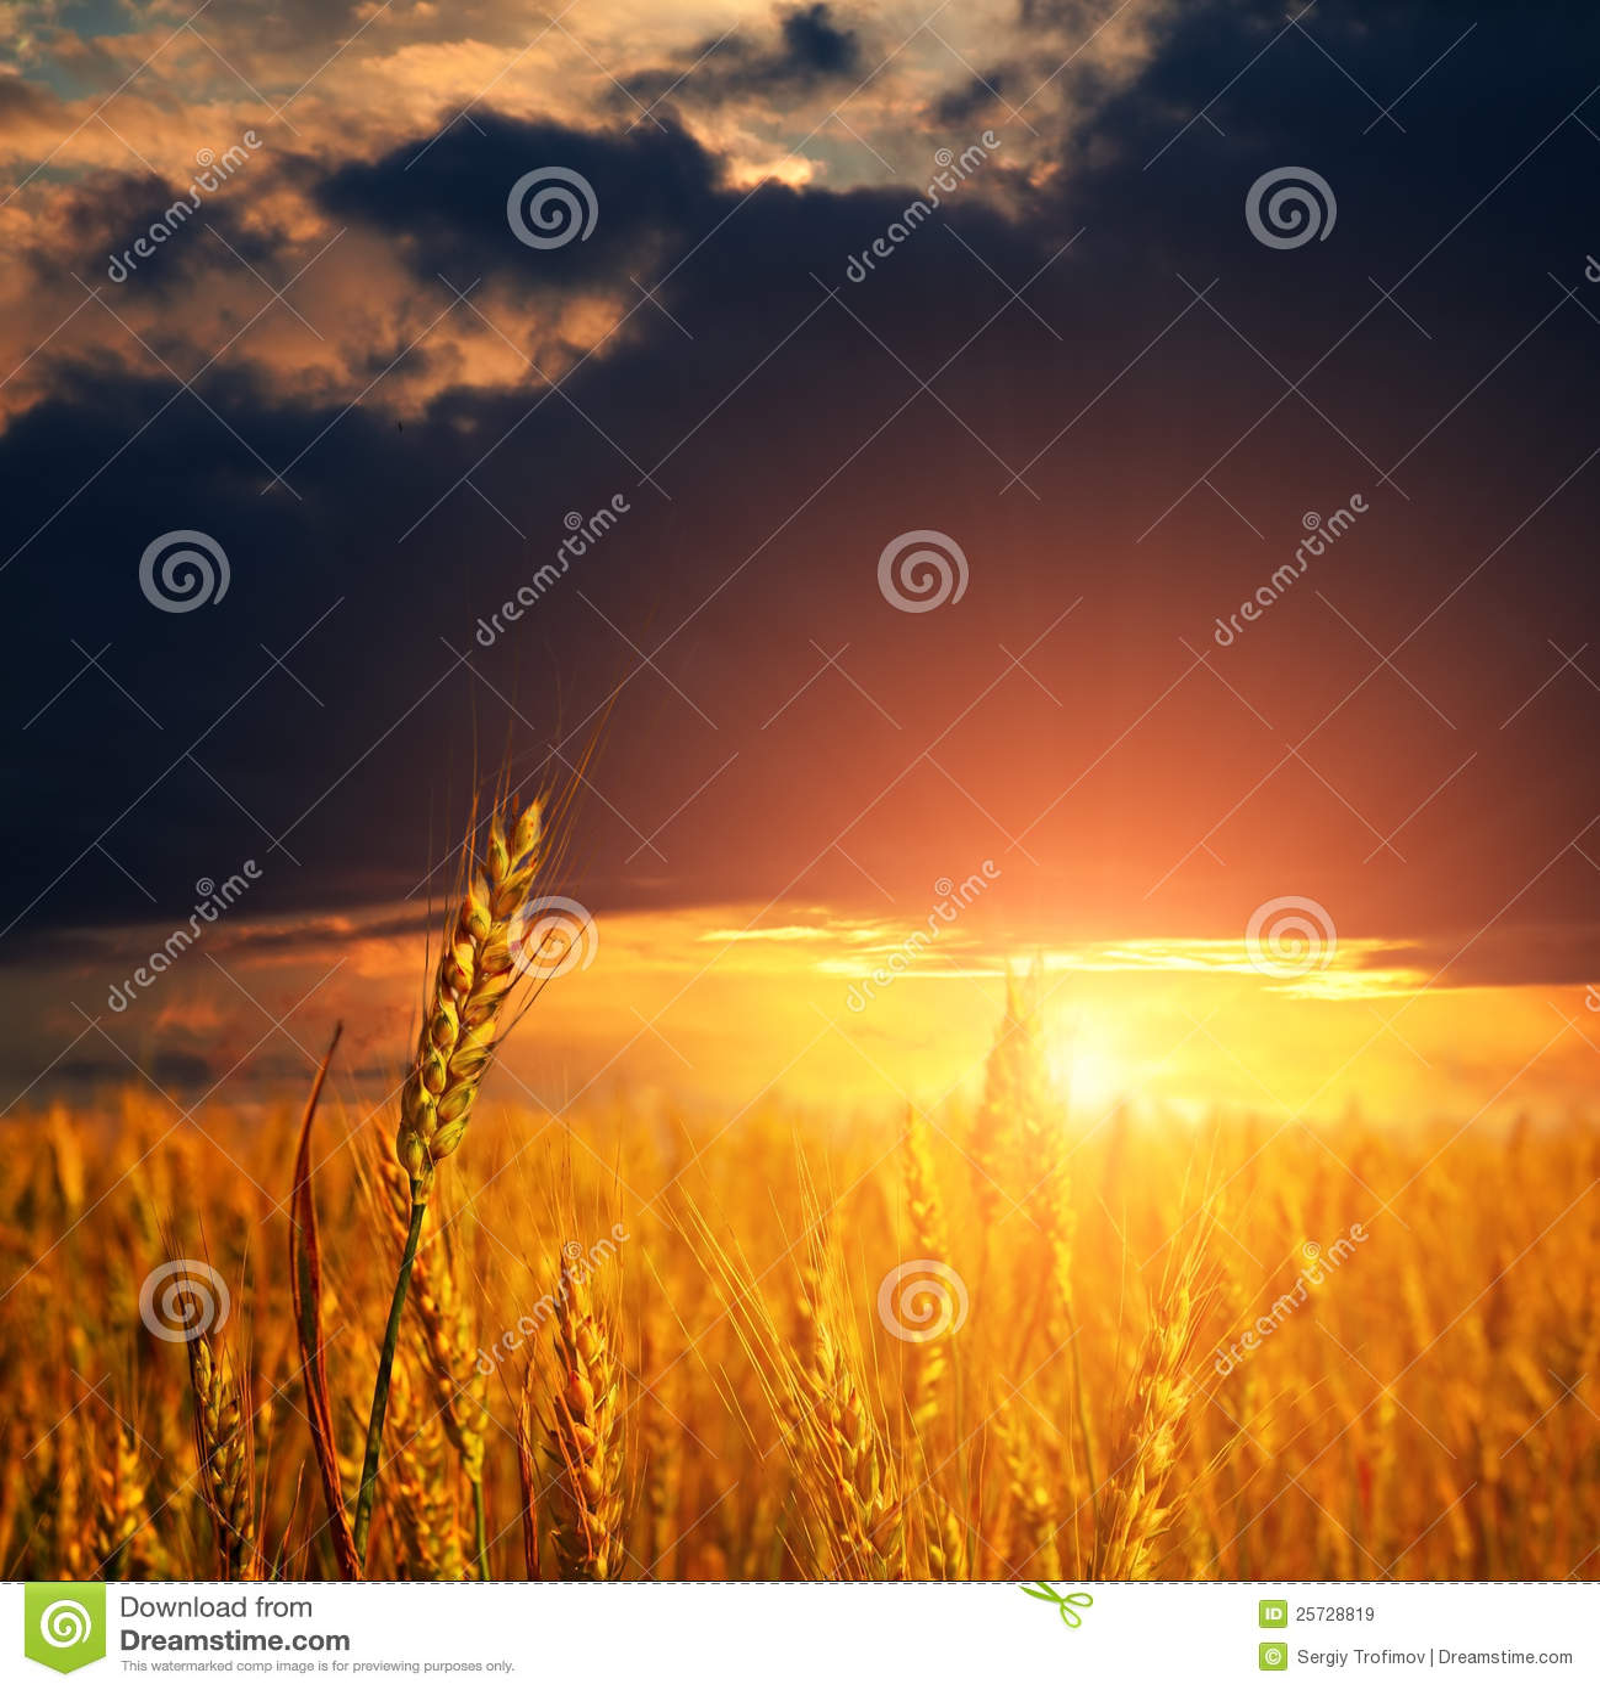 Wheat ears and light on sunset sky